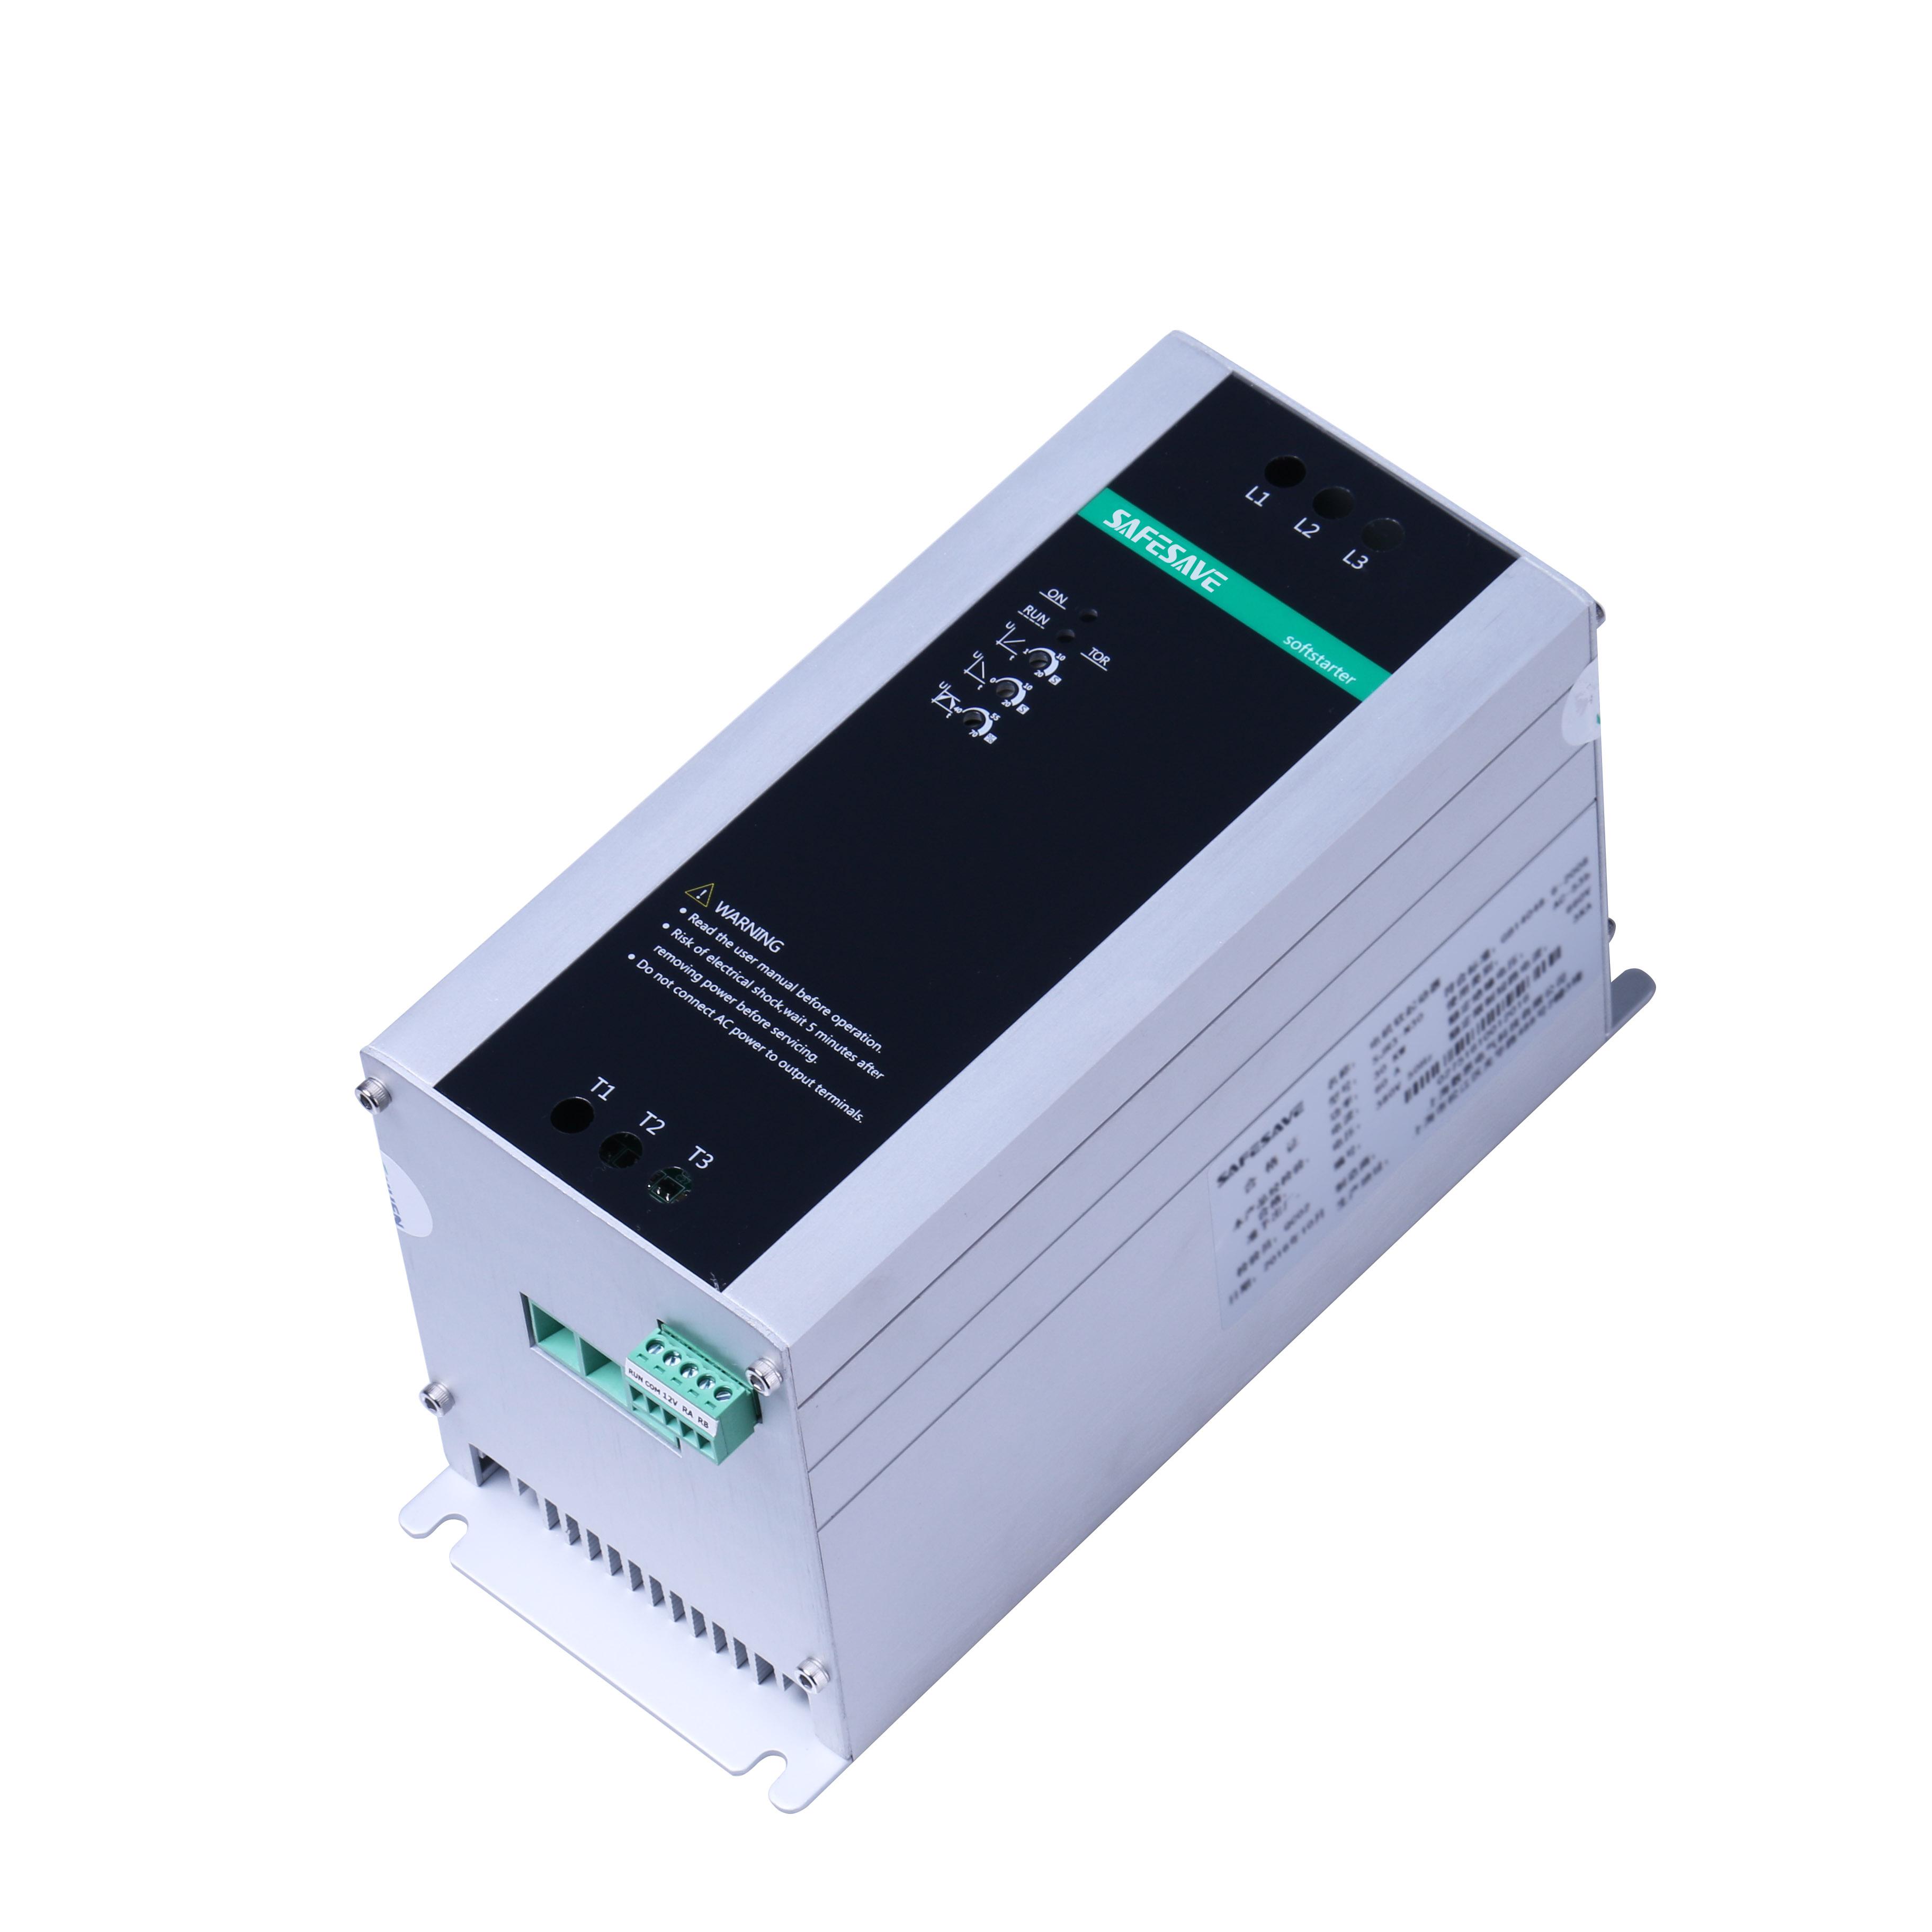 Vfd starter for blower/pump/fan/blender/texile machine